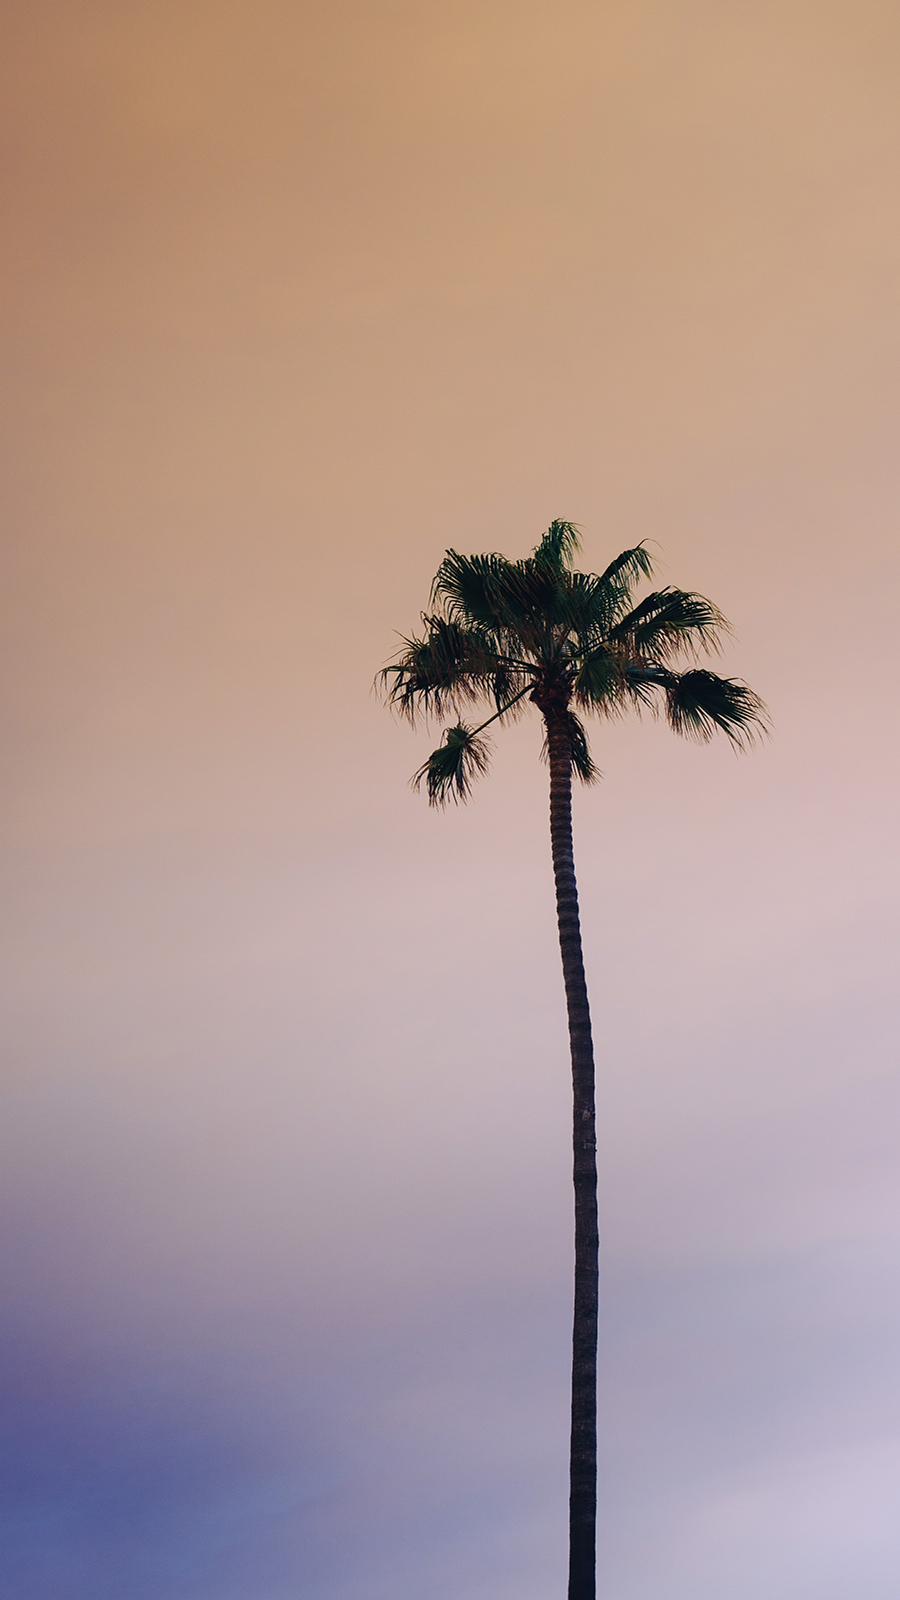 Slim Palm Wallpapers Free Download Phone & Desktop